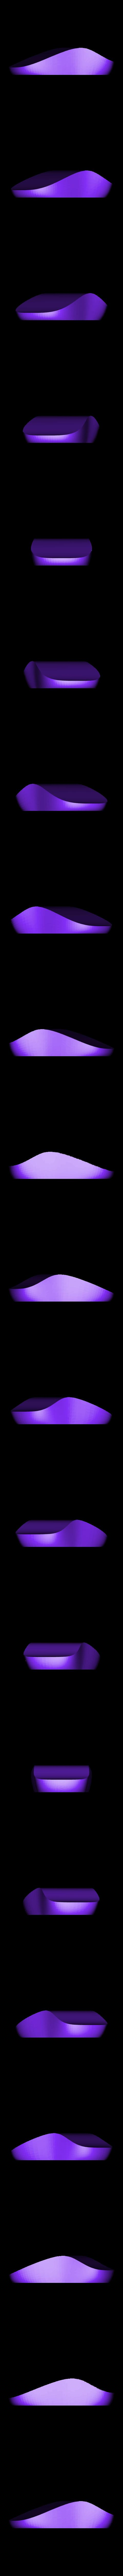 V4_mouse_base.STL Download free STL file Multi-Color Computer Mouse Model: Industrial/Product Design • 3D printable model, MosaicManufacturing